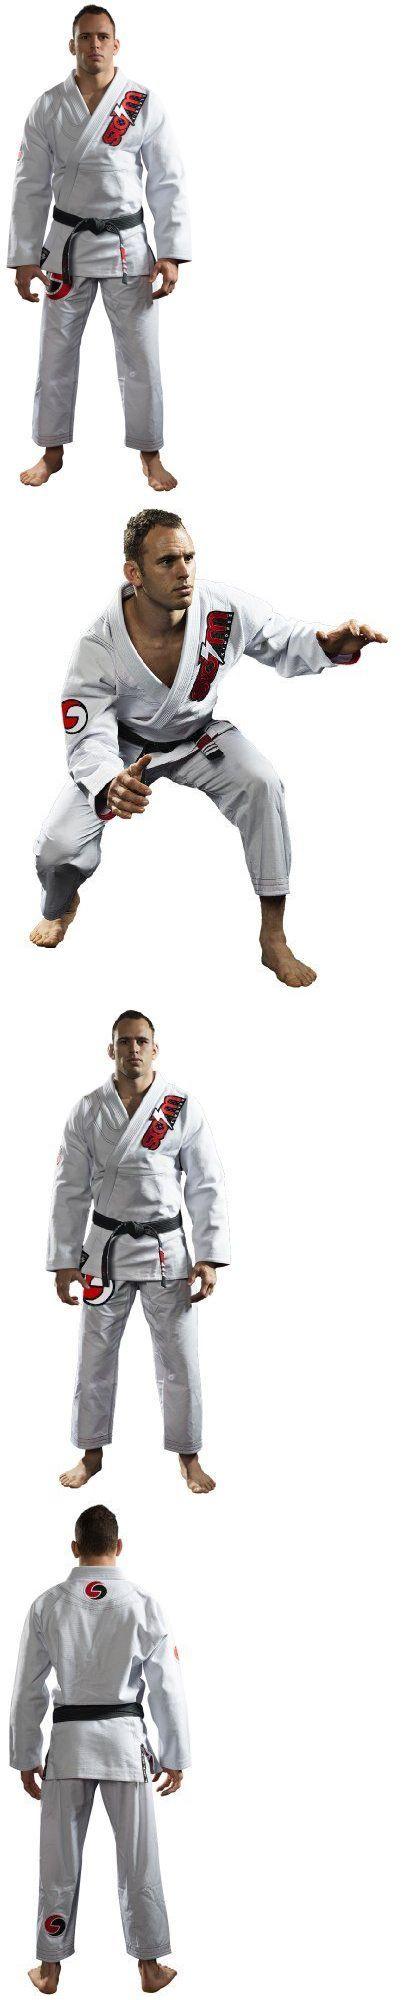 Jackets 179771: Storm Kimonos Supreme Gi White A3 Mens Martial Arts Uniform Jacket, New -> BUY IT NOW ONLY: $214.13 on eBay!